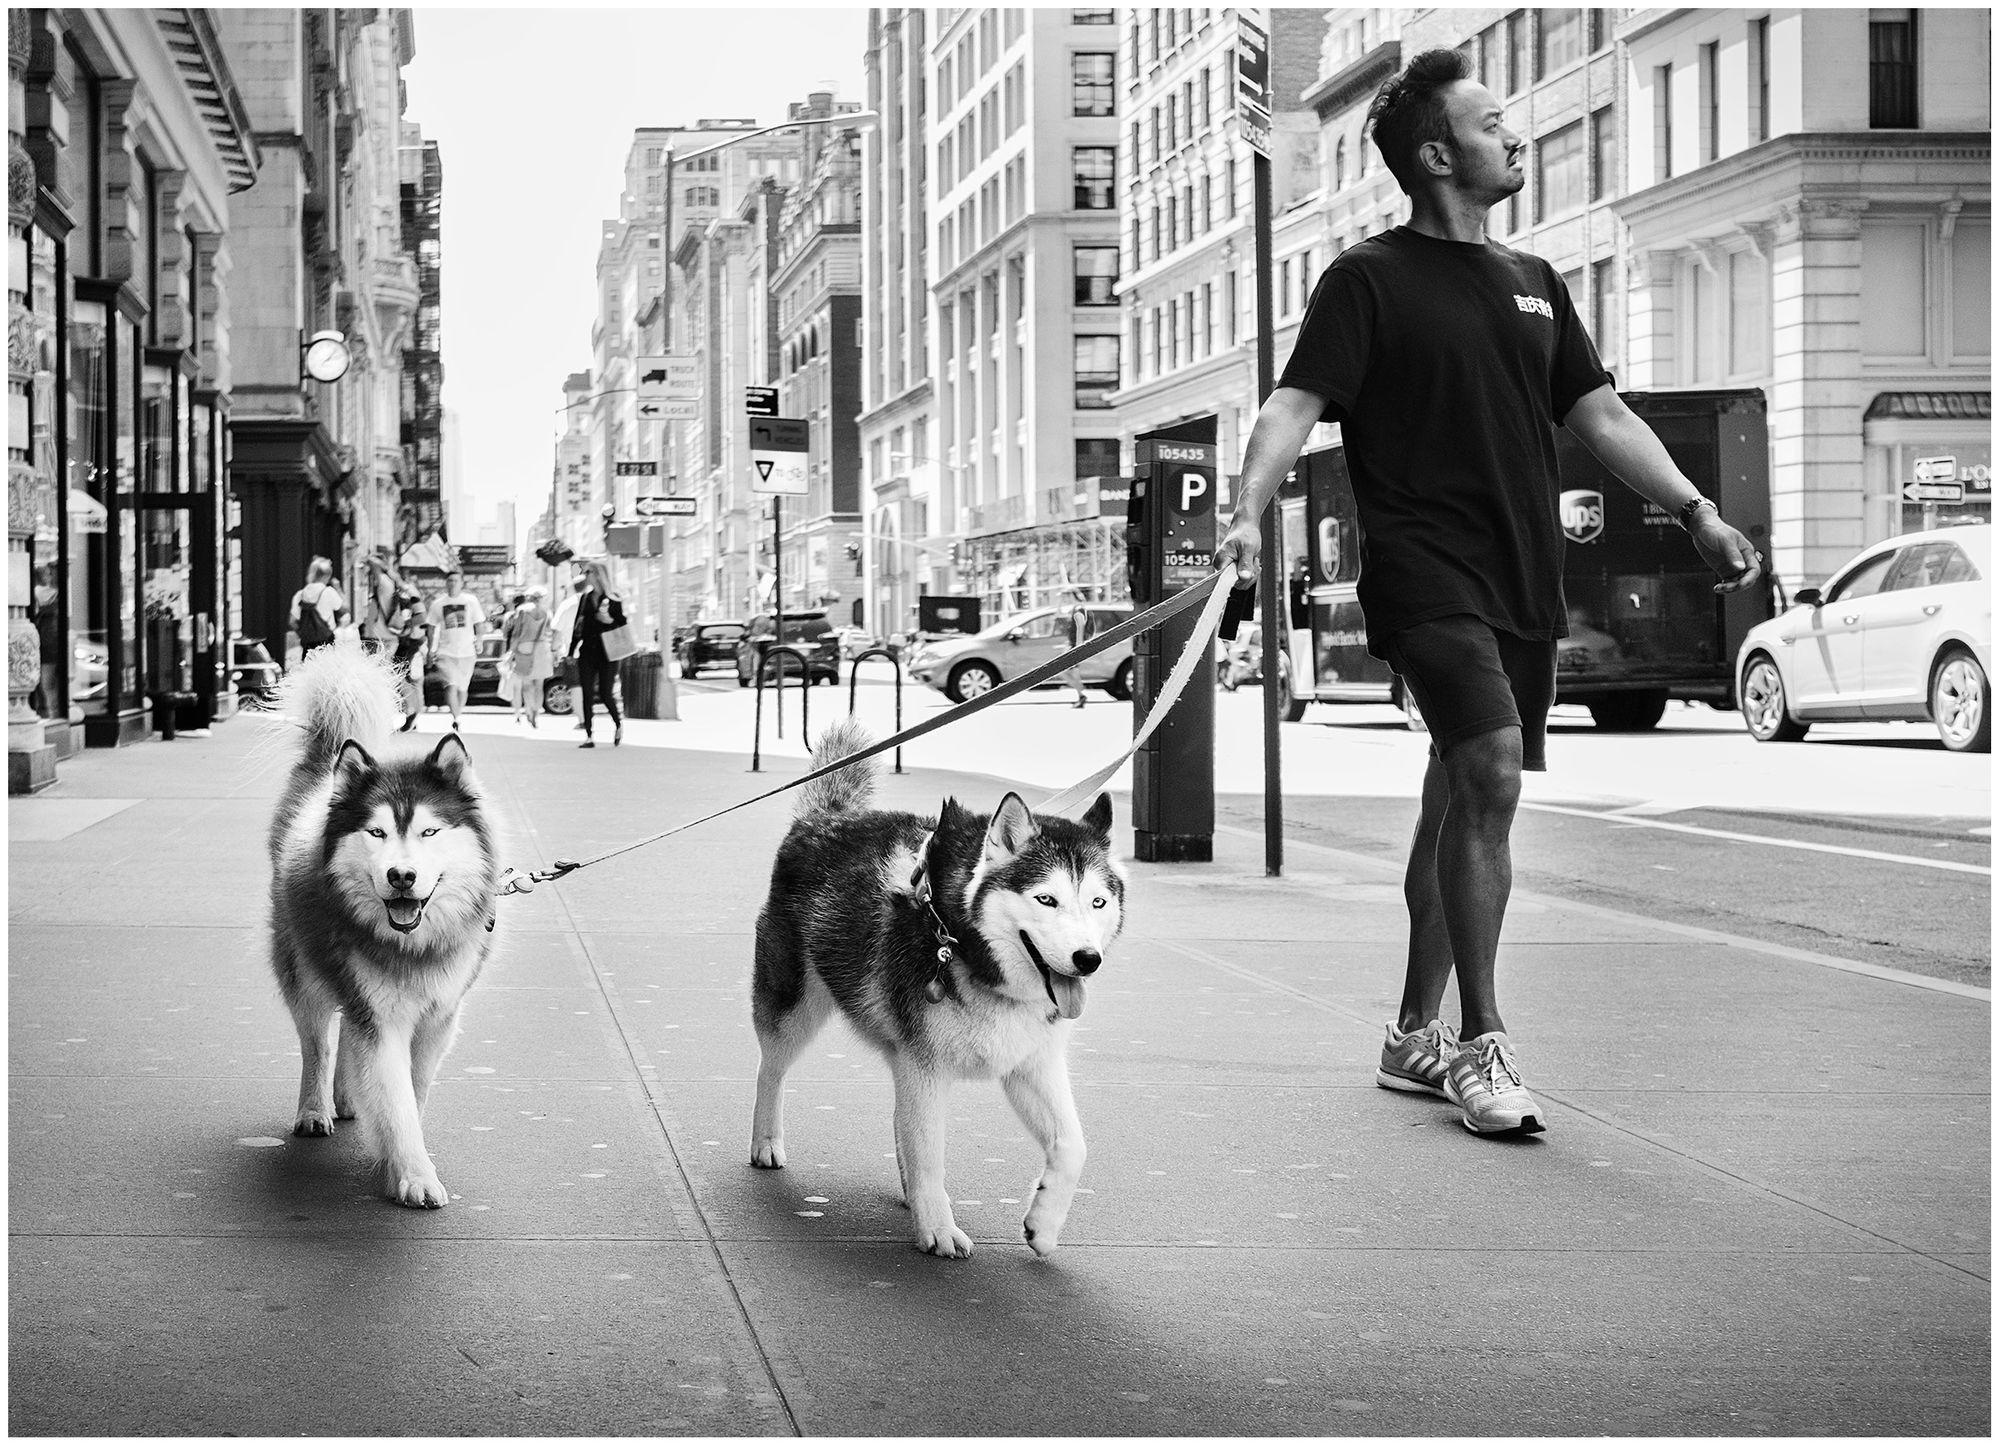 20170826_new_york_city_0089.jpg